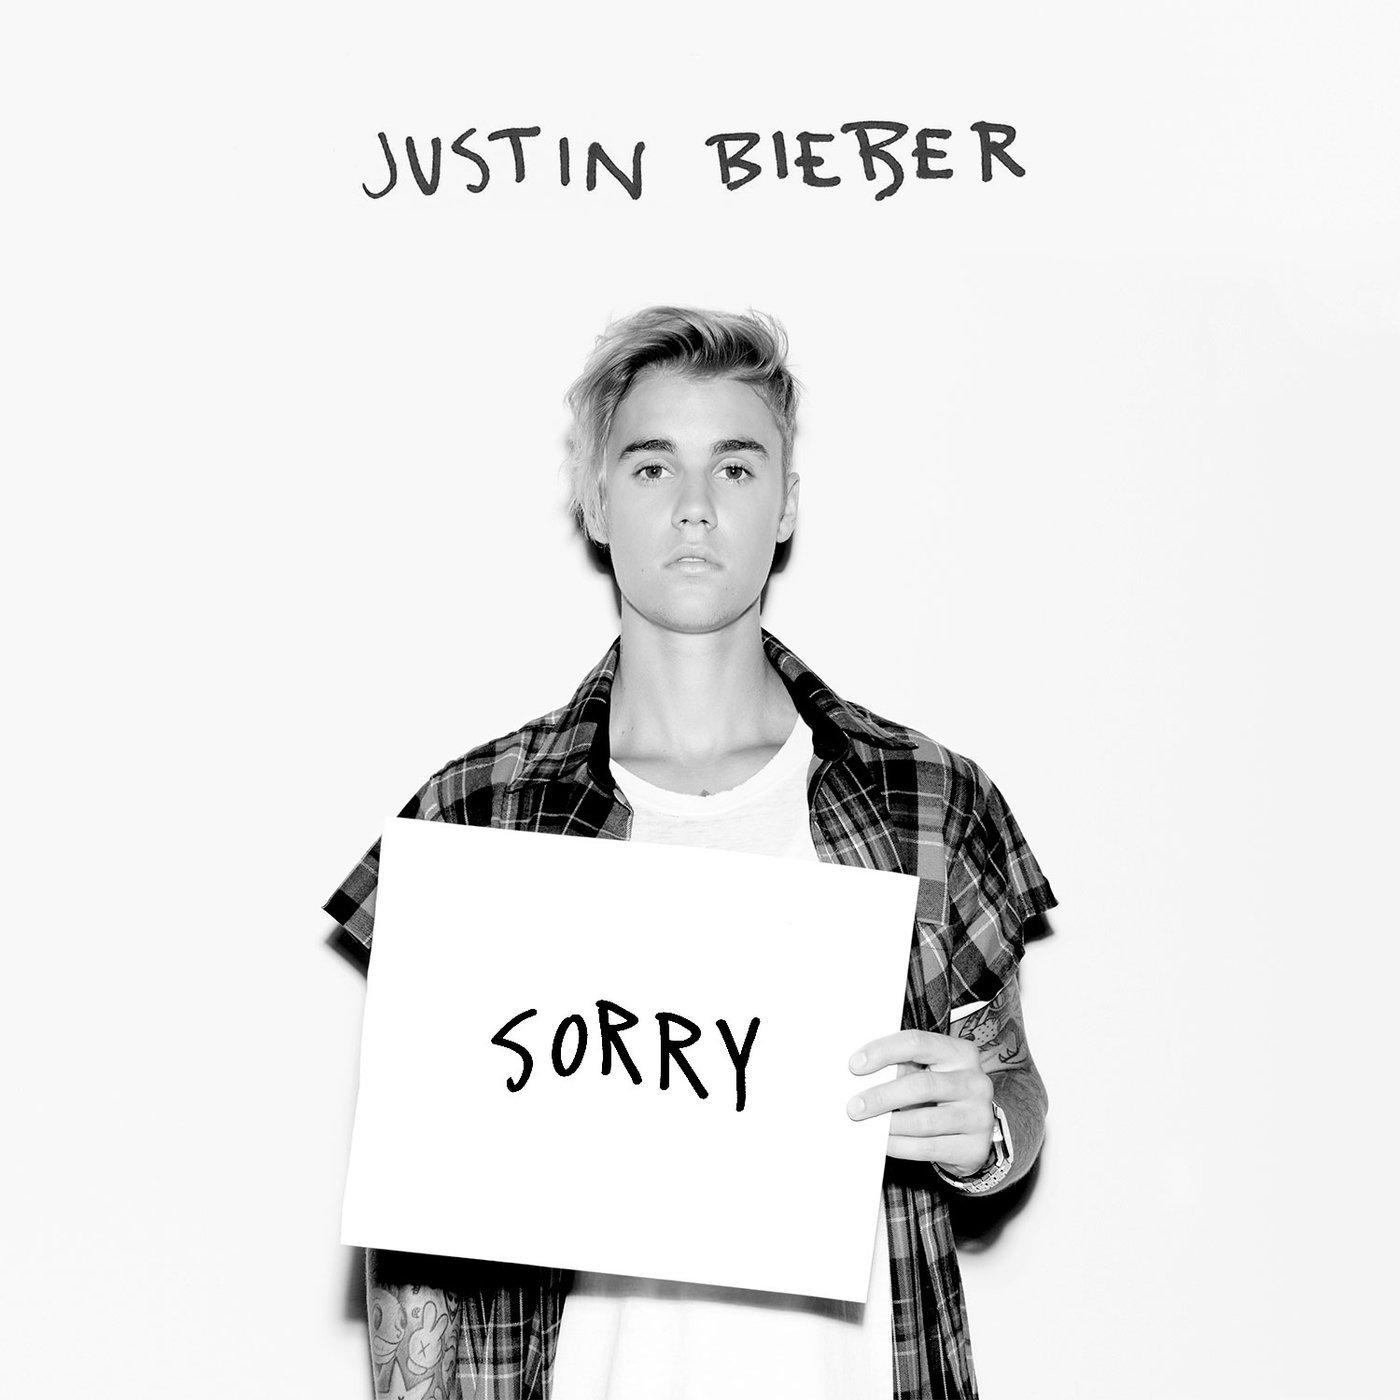 Justin bieber sorry 2015 1500x1500